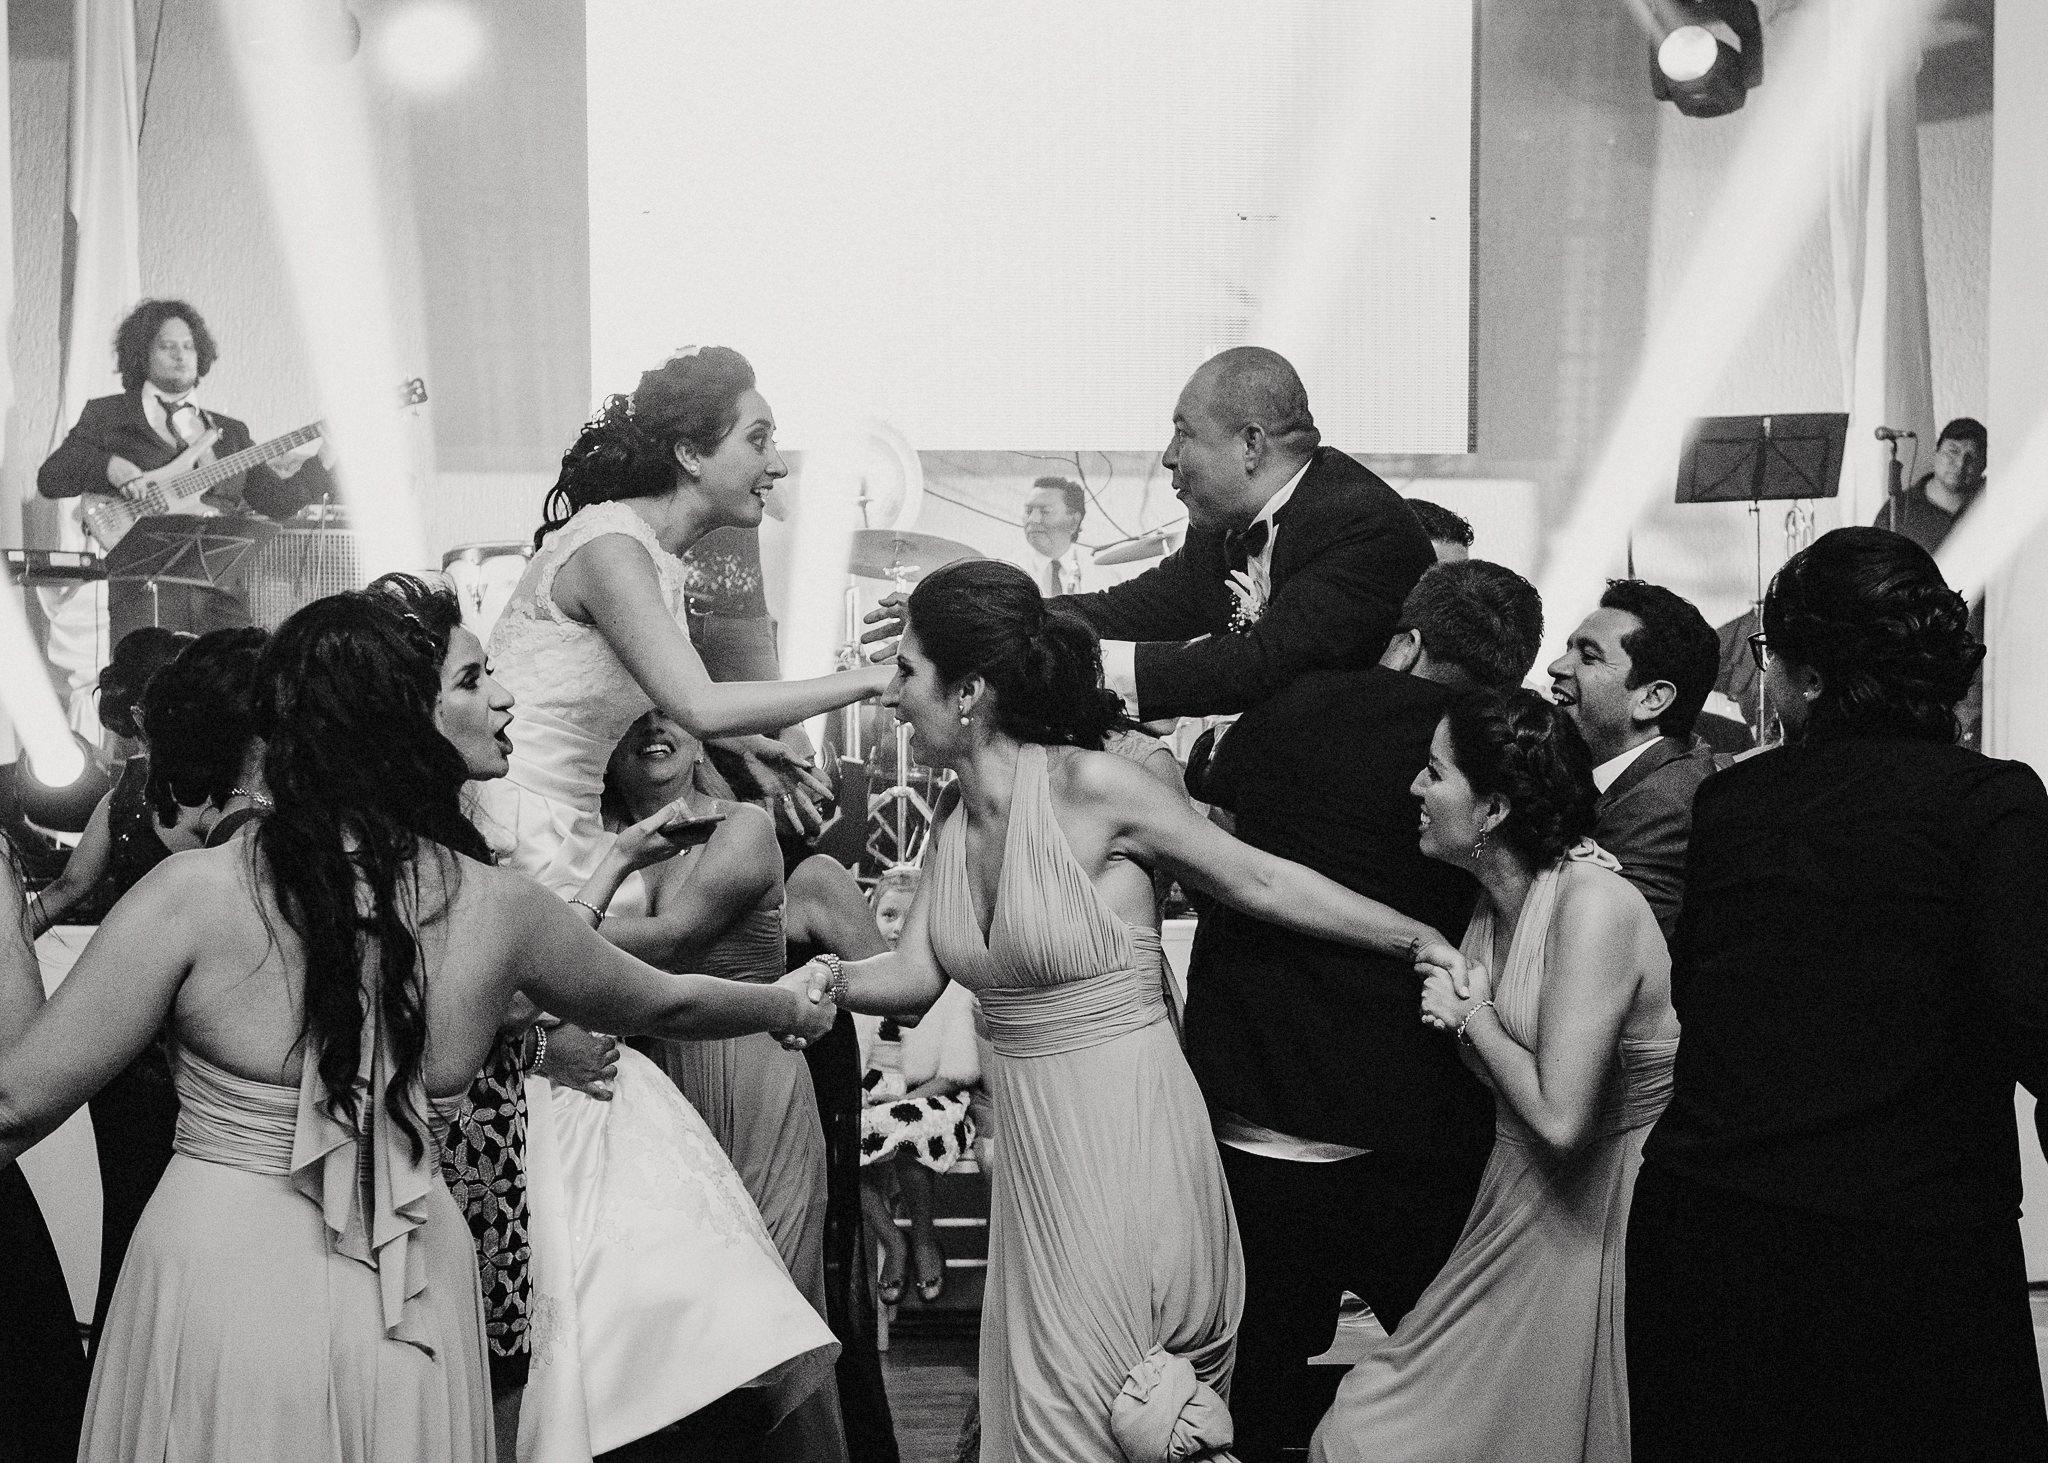 Wedding-Boda-Tulancingo-Hidalgo-Salon-Essenzia-Luis-Houdin-65-film